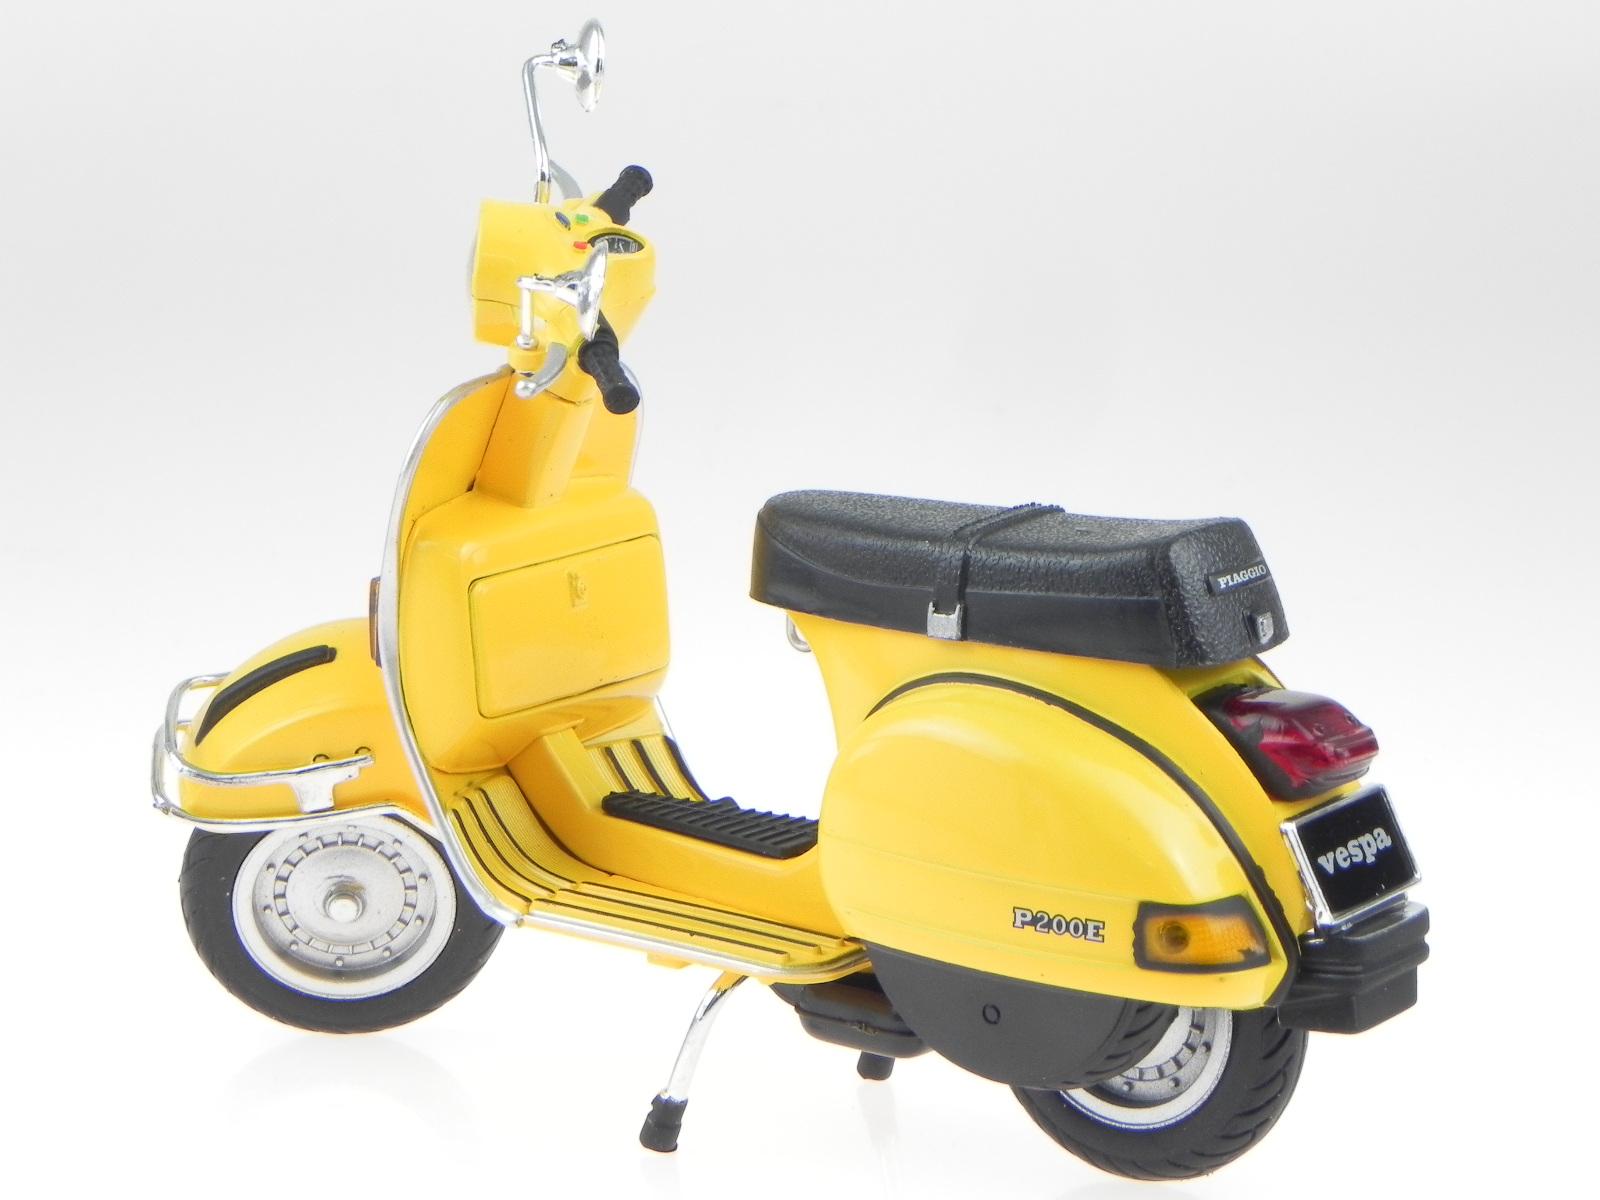 vespa p 200 e px 1978 yellow metall modell 42123 newray 1 12 ebay. Black Bedroom Furniture Sets. Home Design Ideas